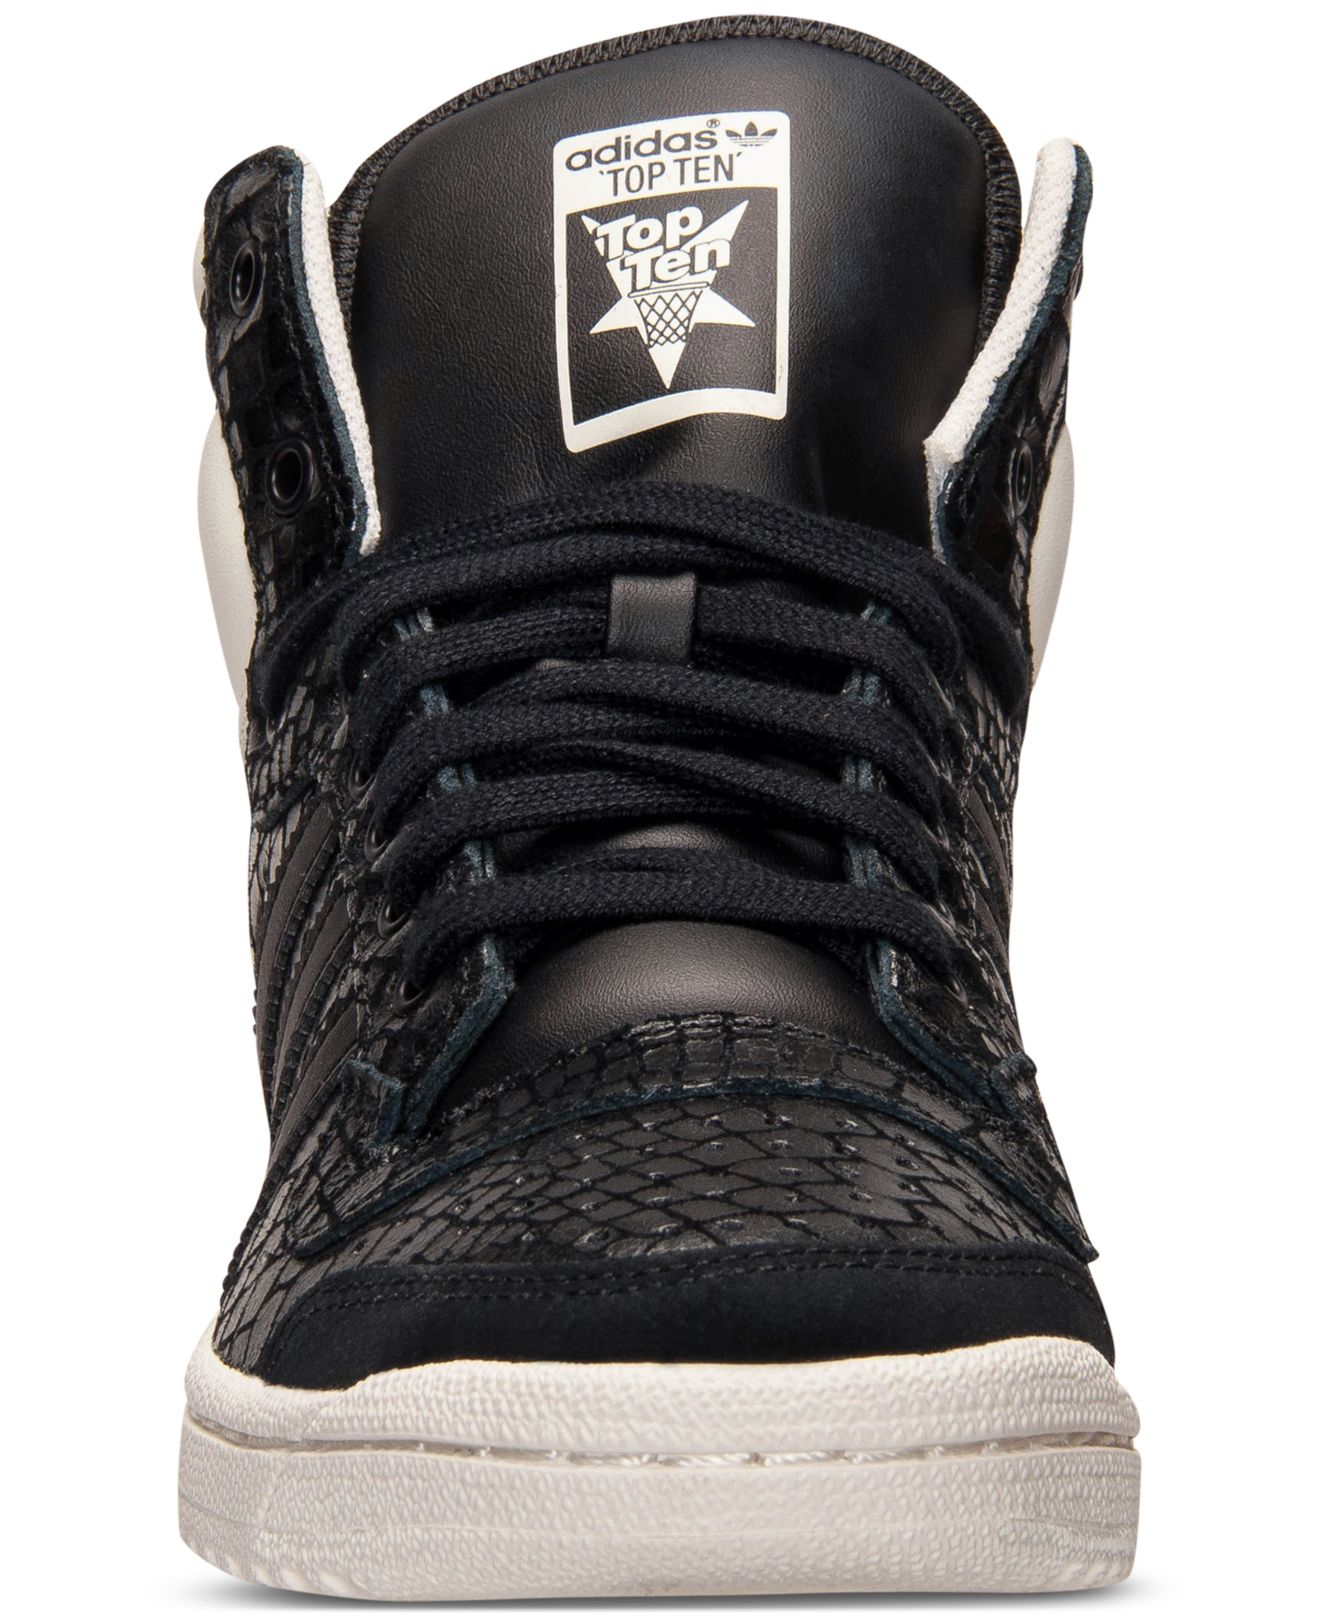 new arrival 2f922 712e2 adidas Originals Women s Top Ten Hi Casual Sneakers From Finish Line ...